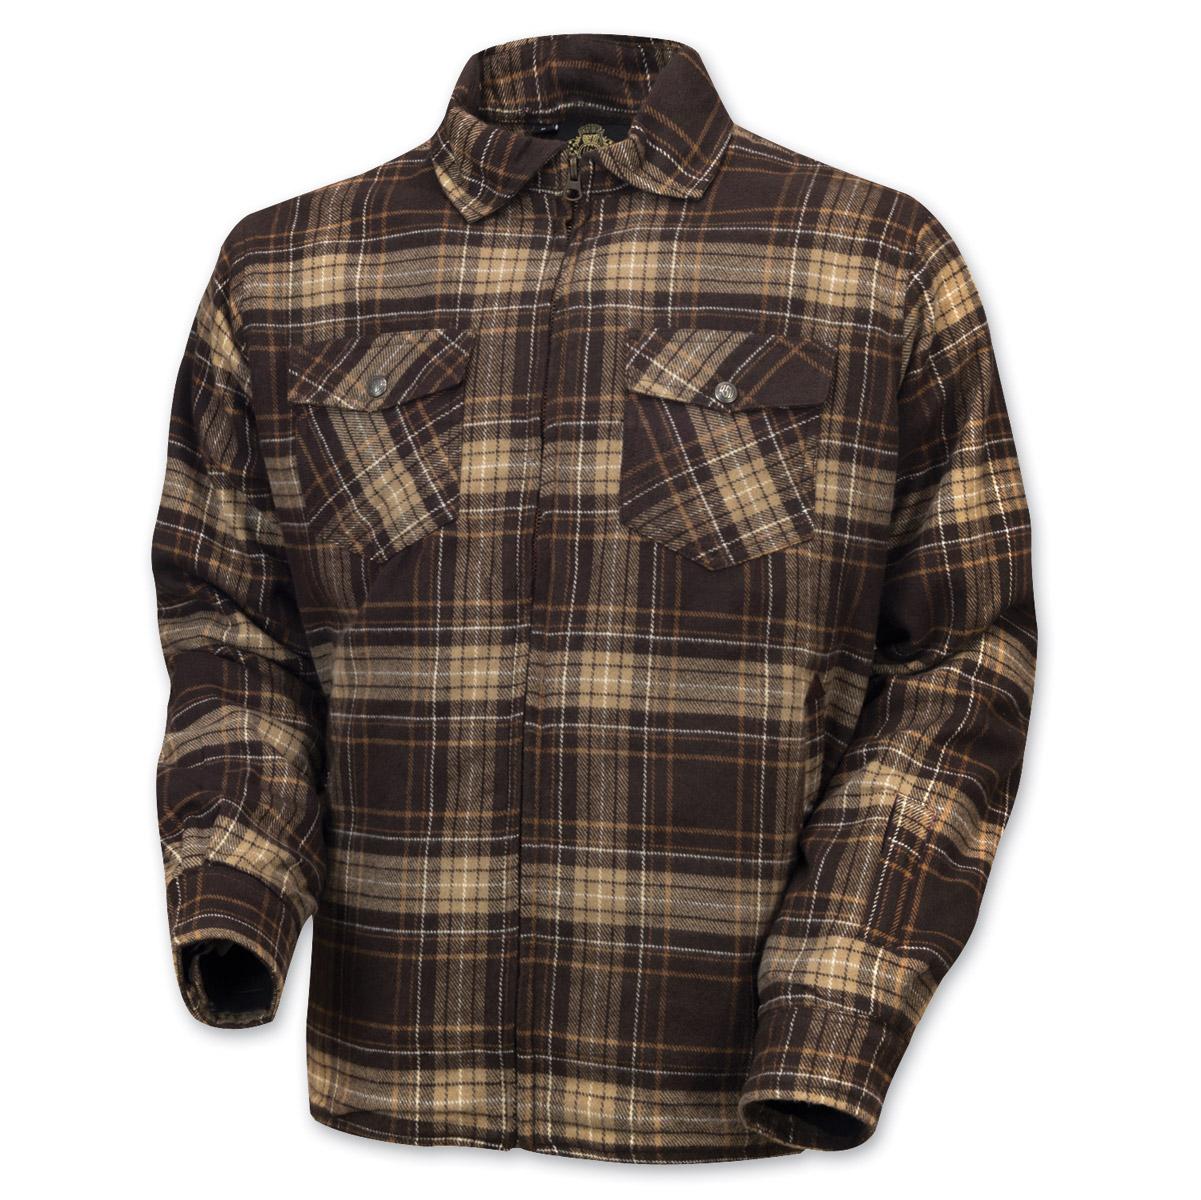 Roland Sands Design Men's Stoddard Brown Plaid Long Sleeve Shirt